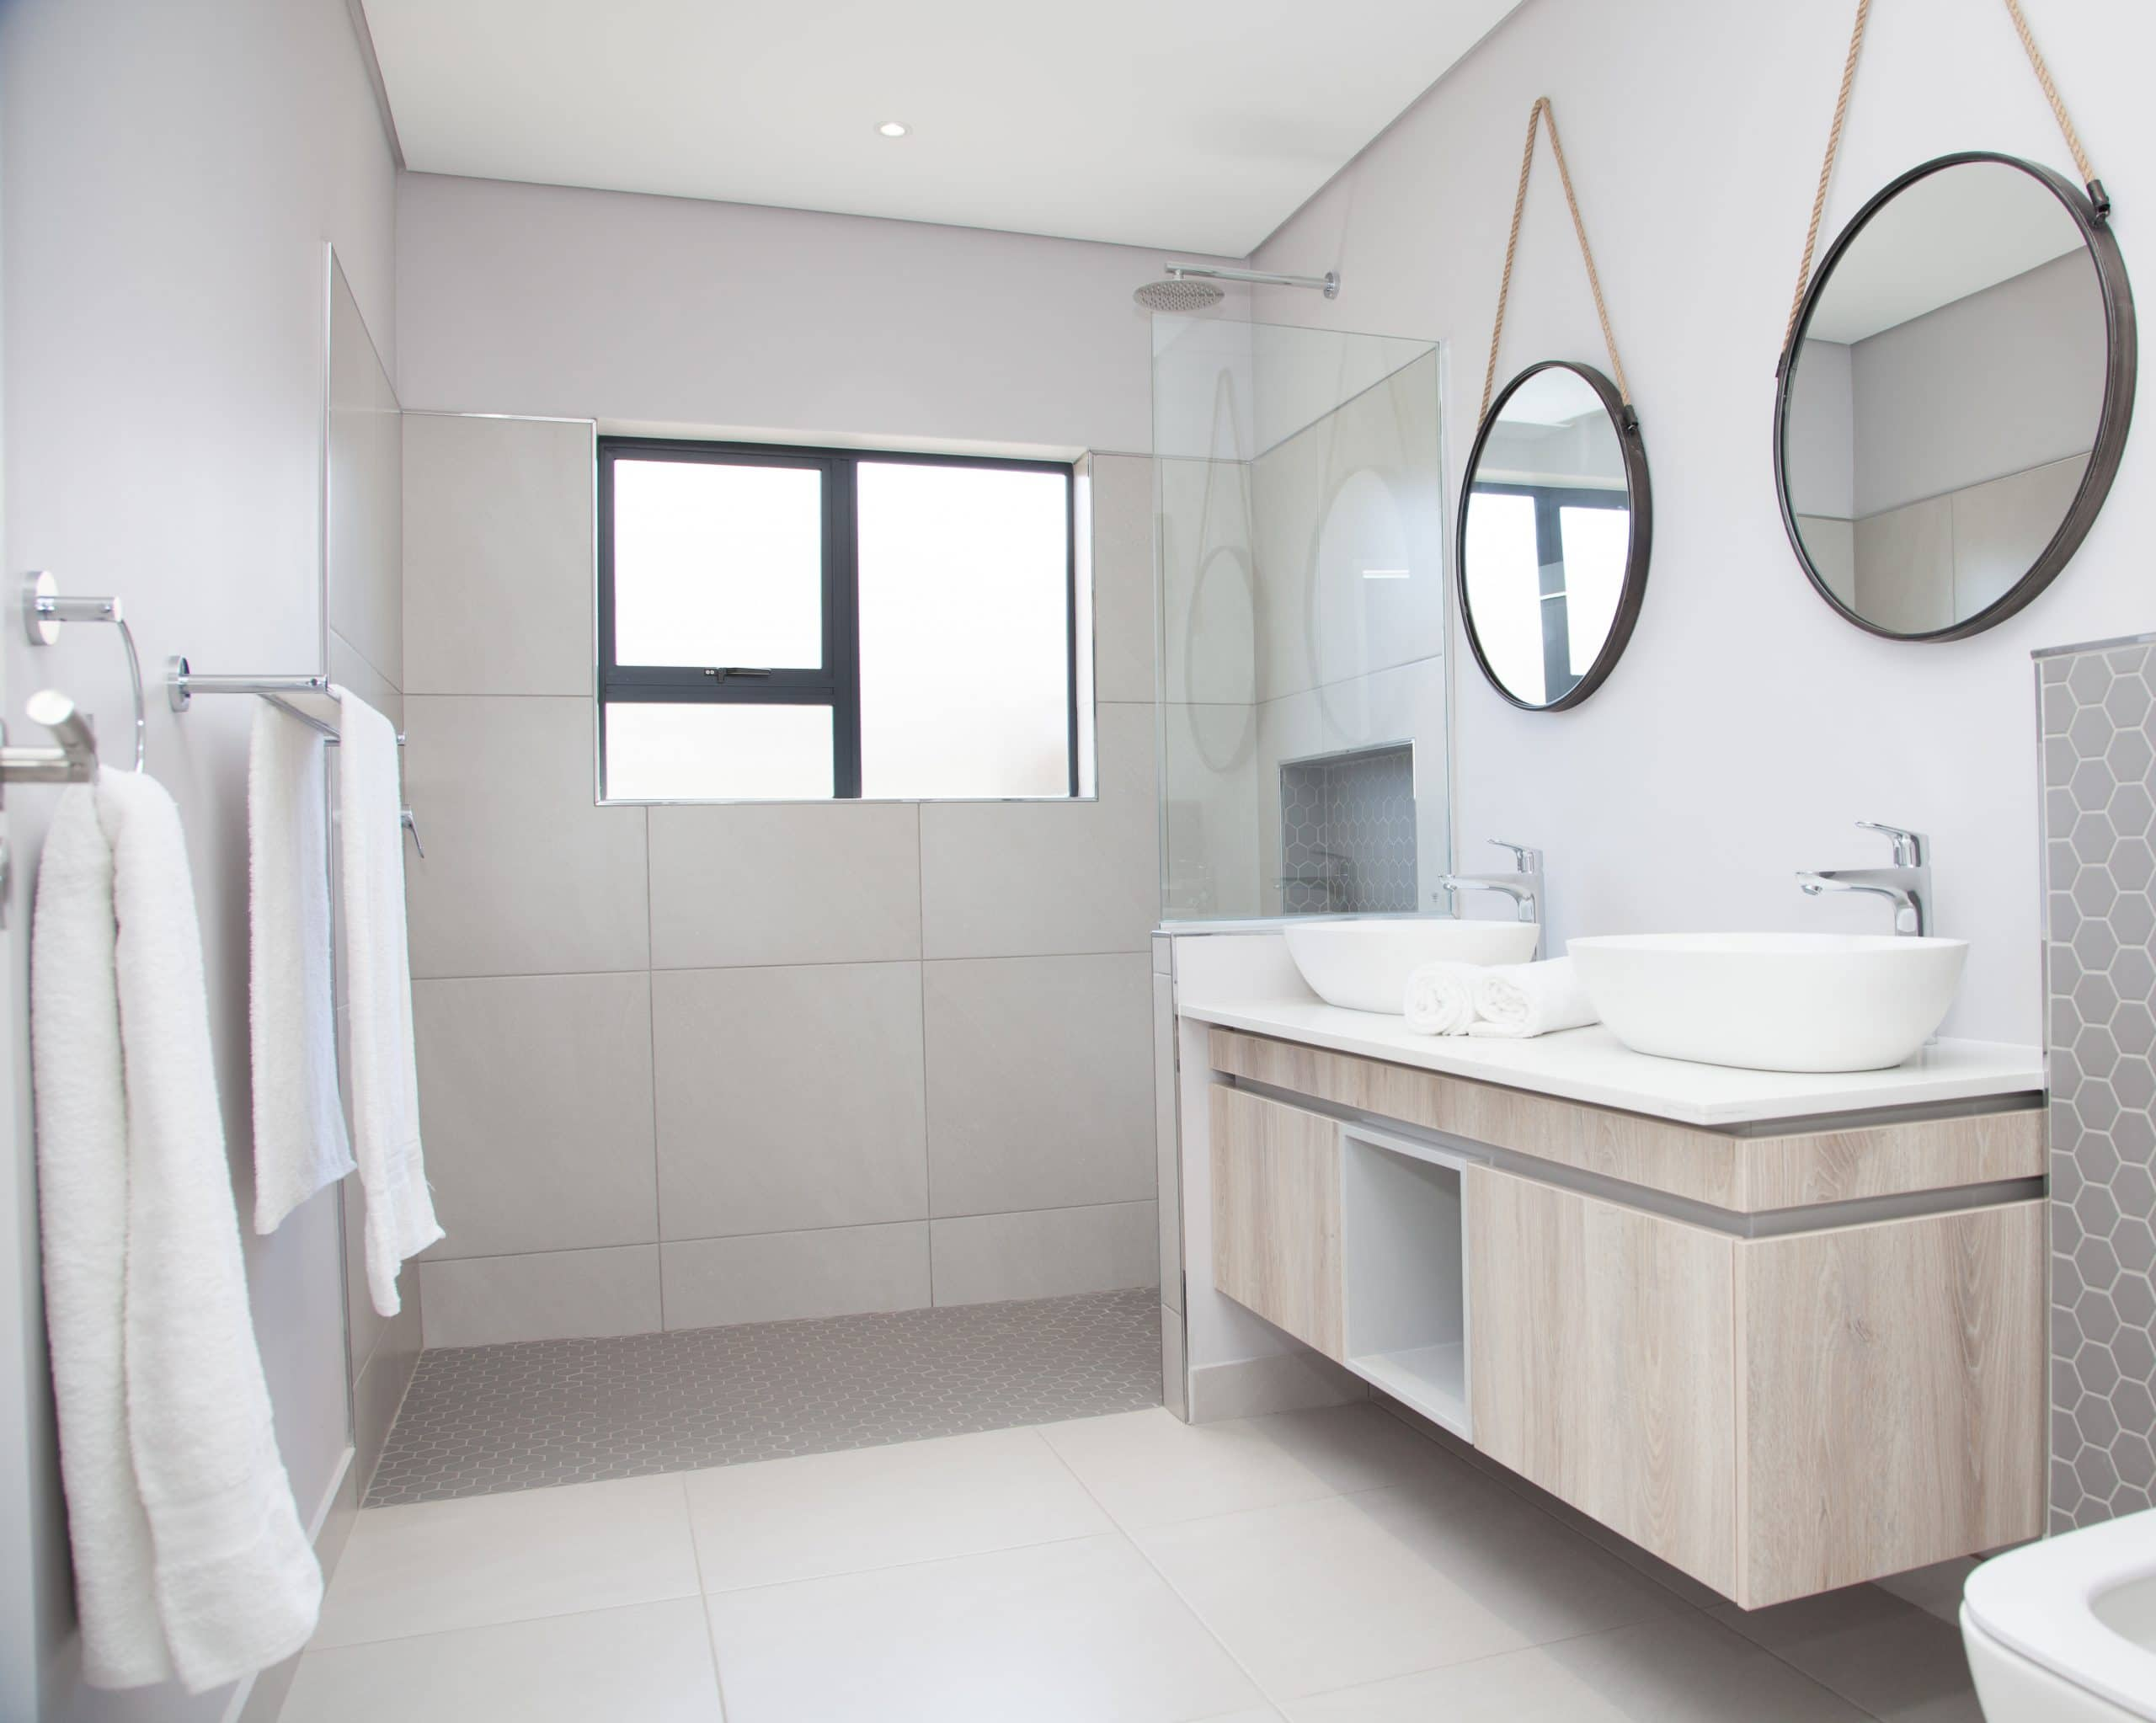 coricraft round hanging mirrors with open shower